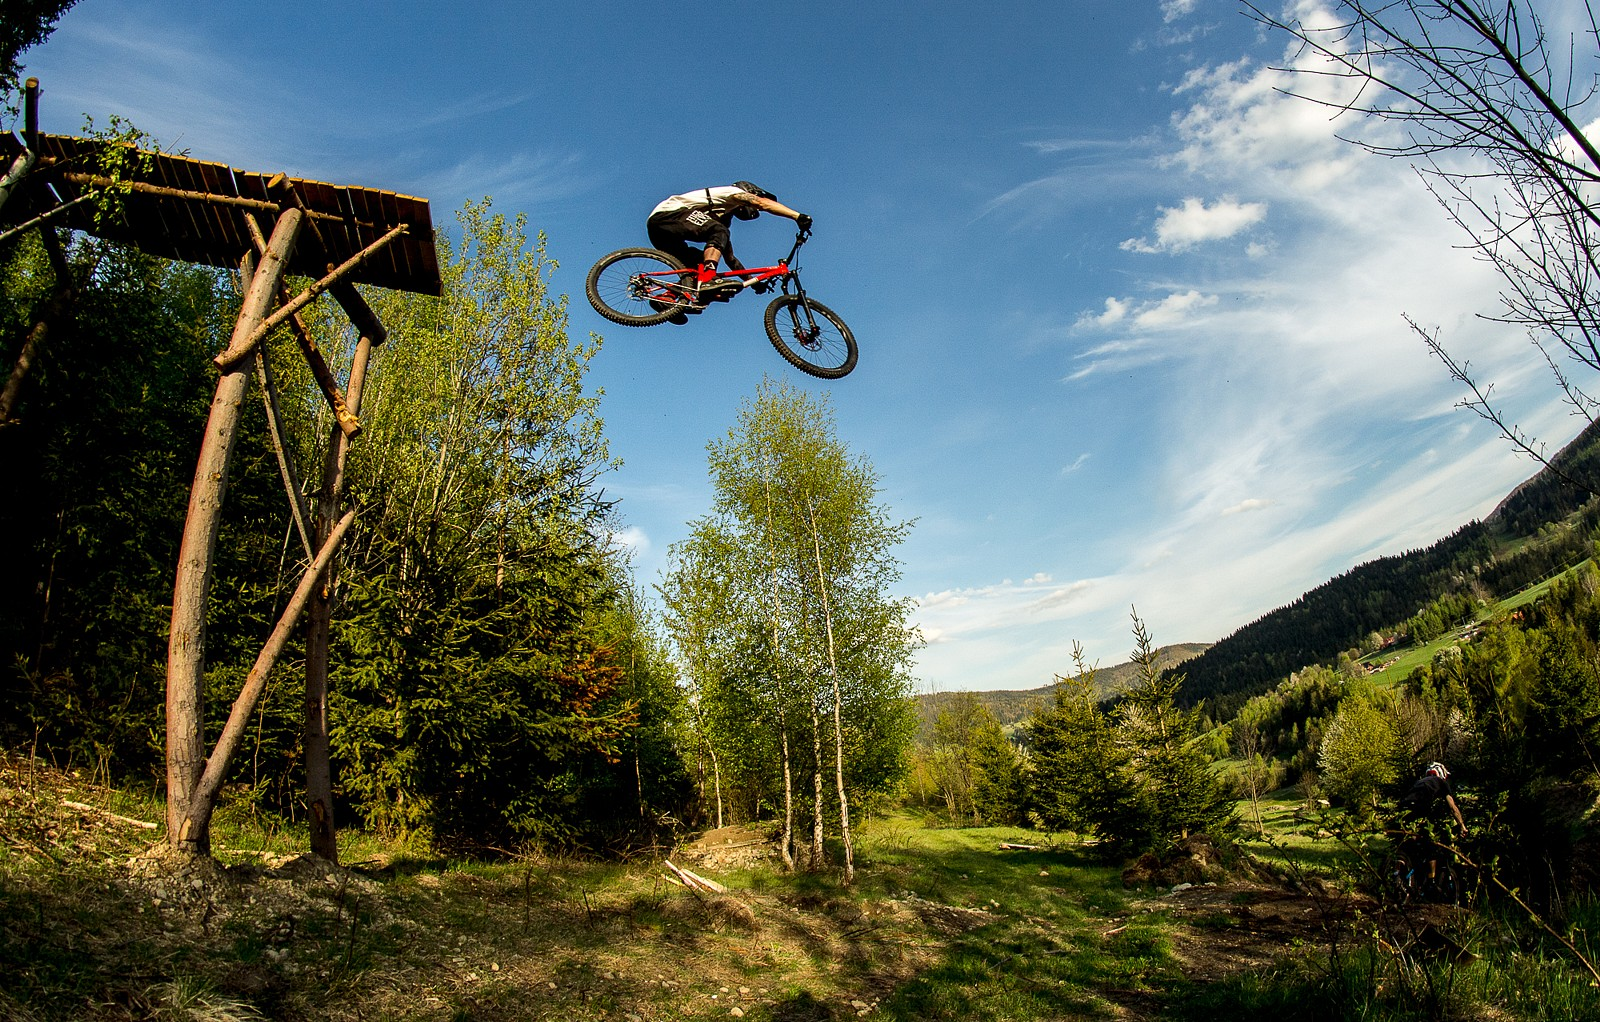 hardtail hoonin' - Banan - Mountain Biking Pictures - Vital MTB